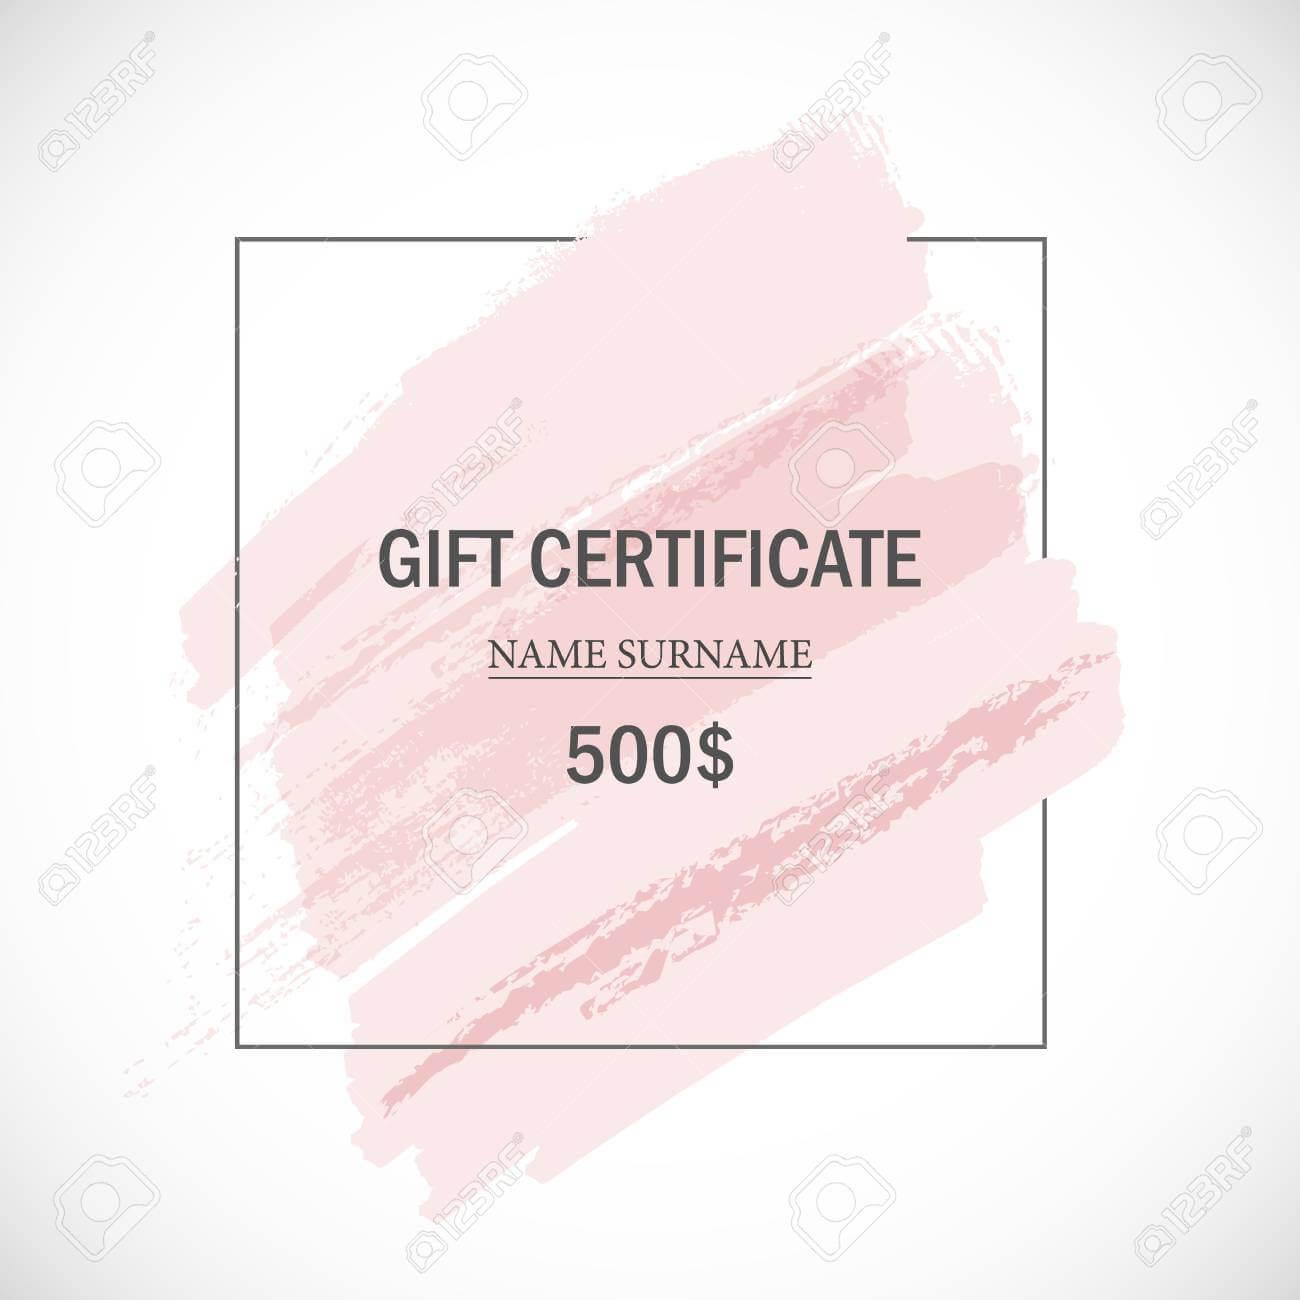 Pink Gift Certificate Template. Regarding Pink Gift Certificate Template